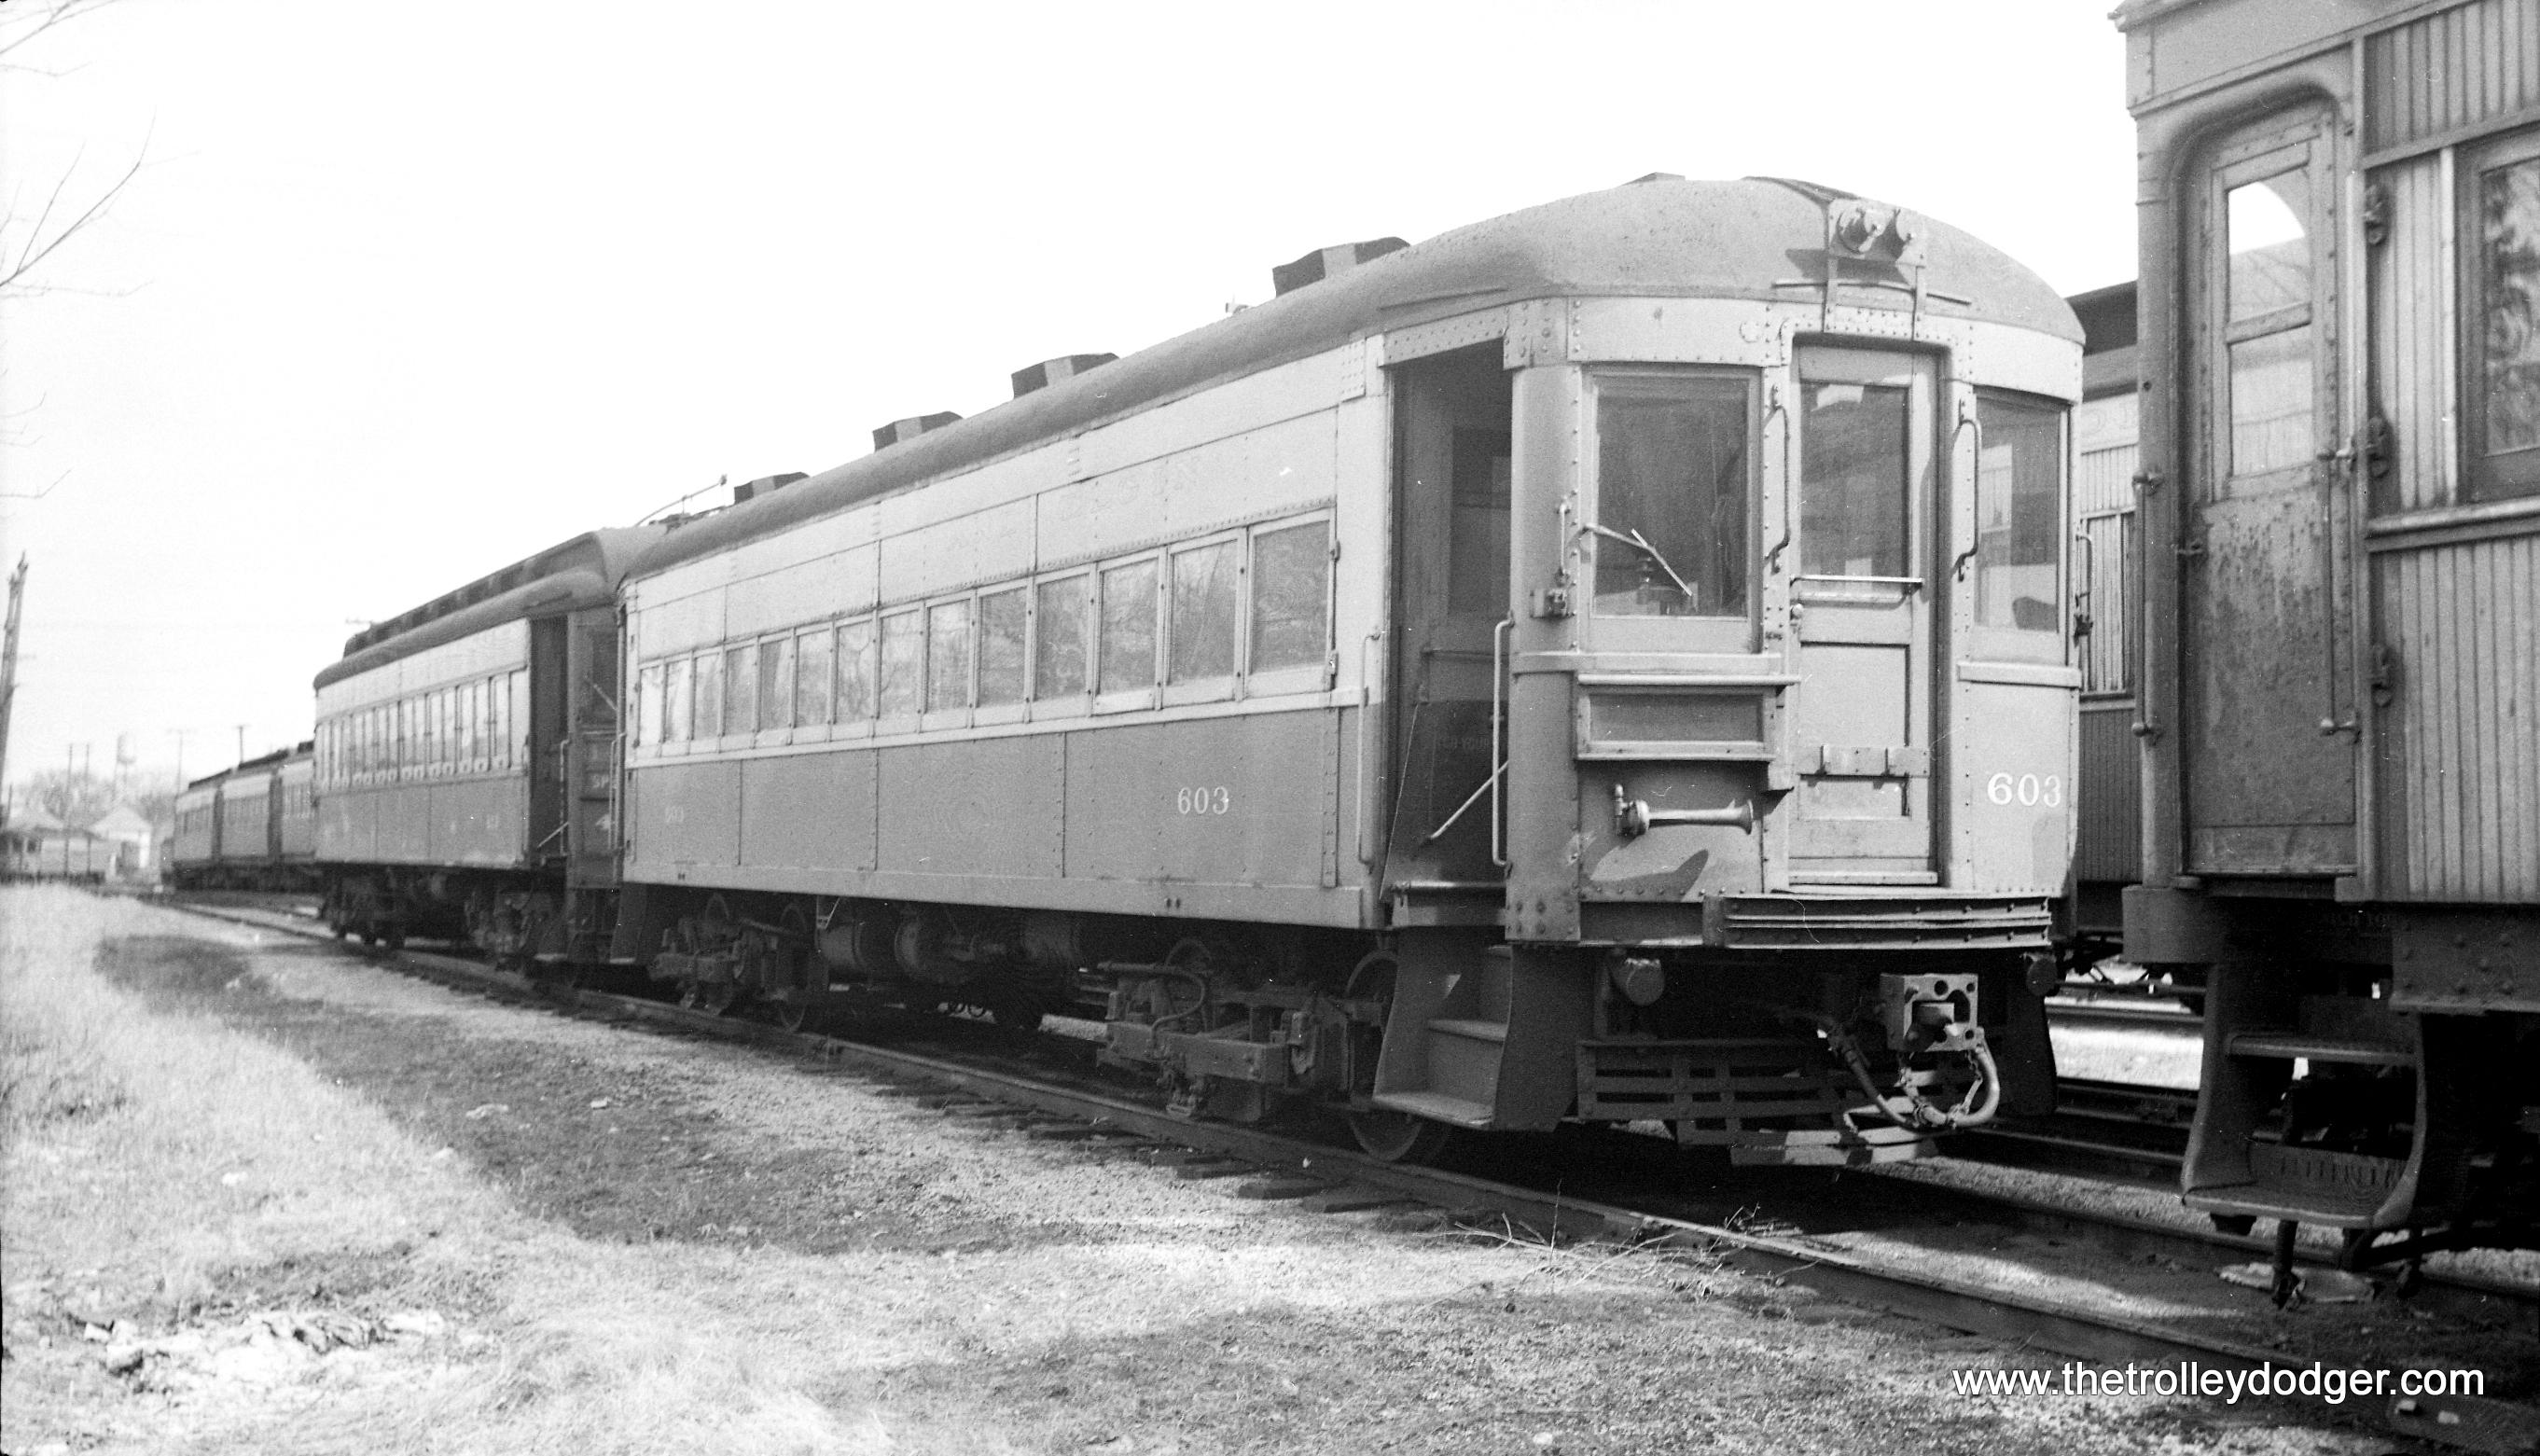 Washington baltimore annapolis the trolley dodger for Klakring motor co annapolis